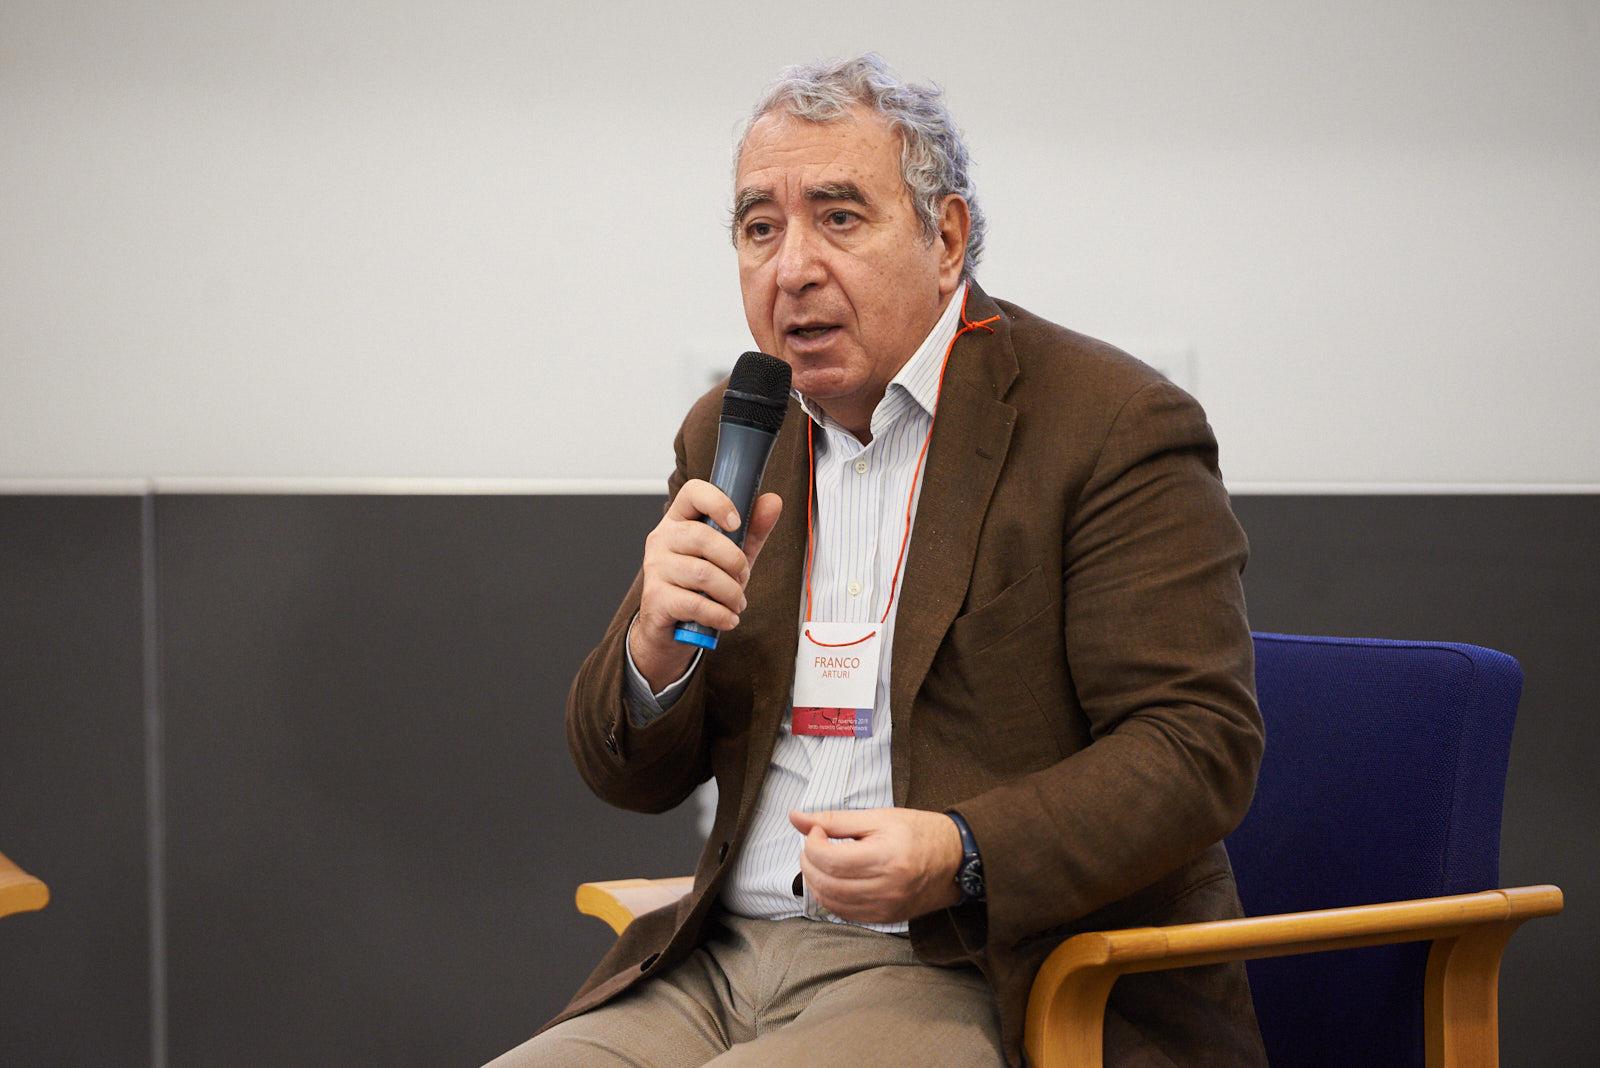 Franco Arturi, director of the Candido Cannavò Foundation